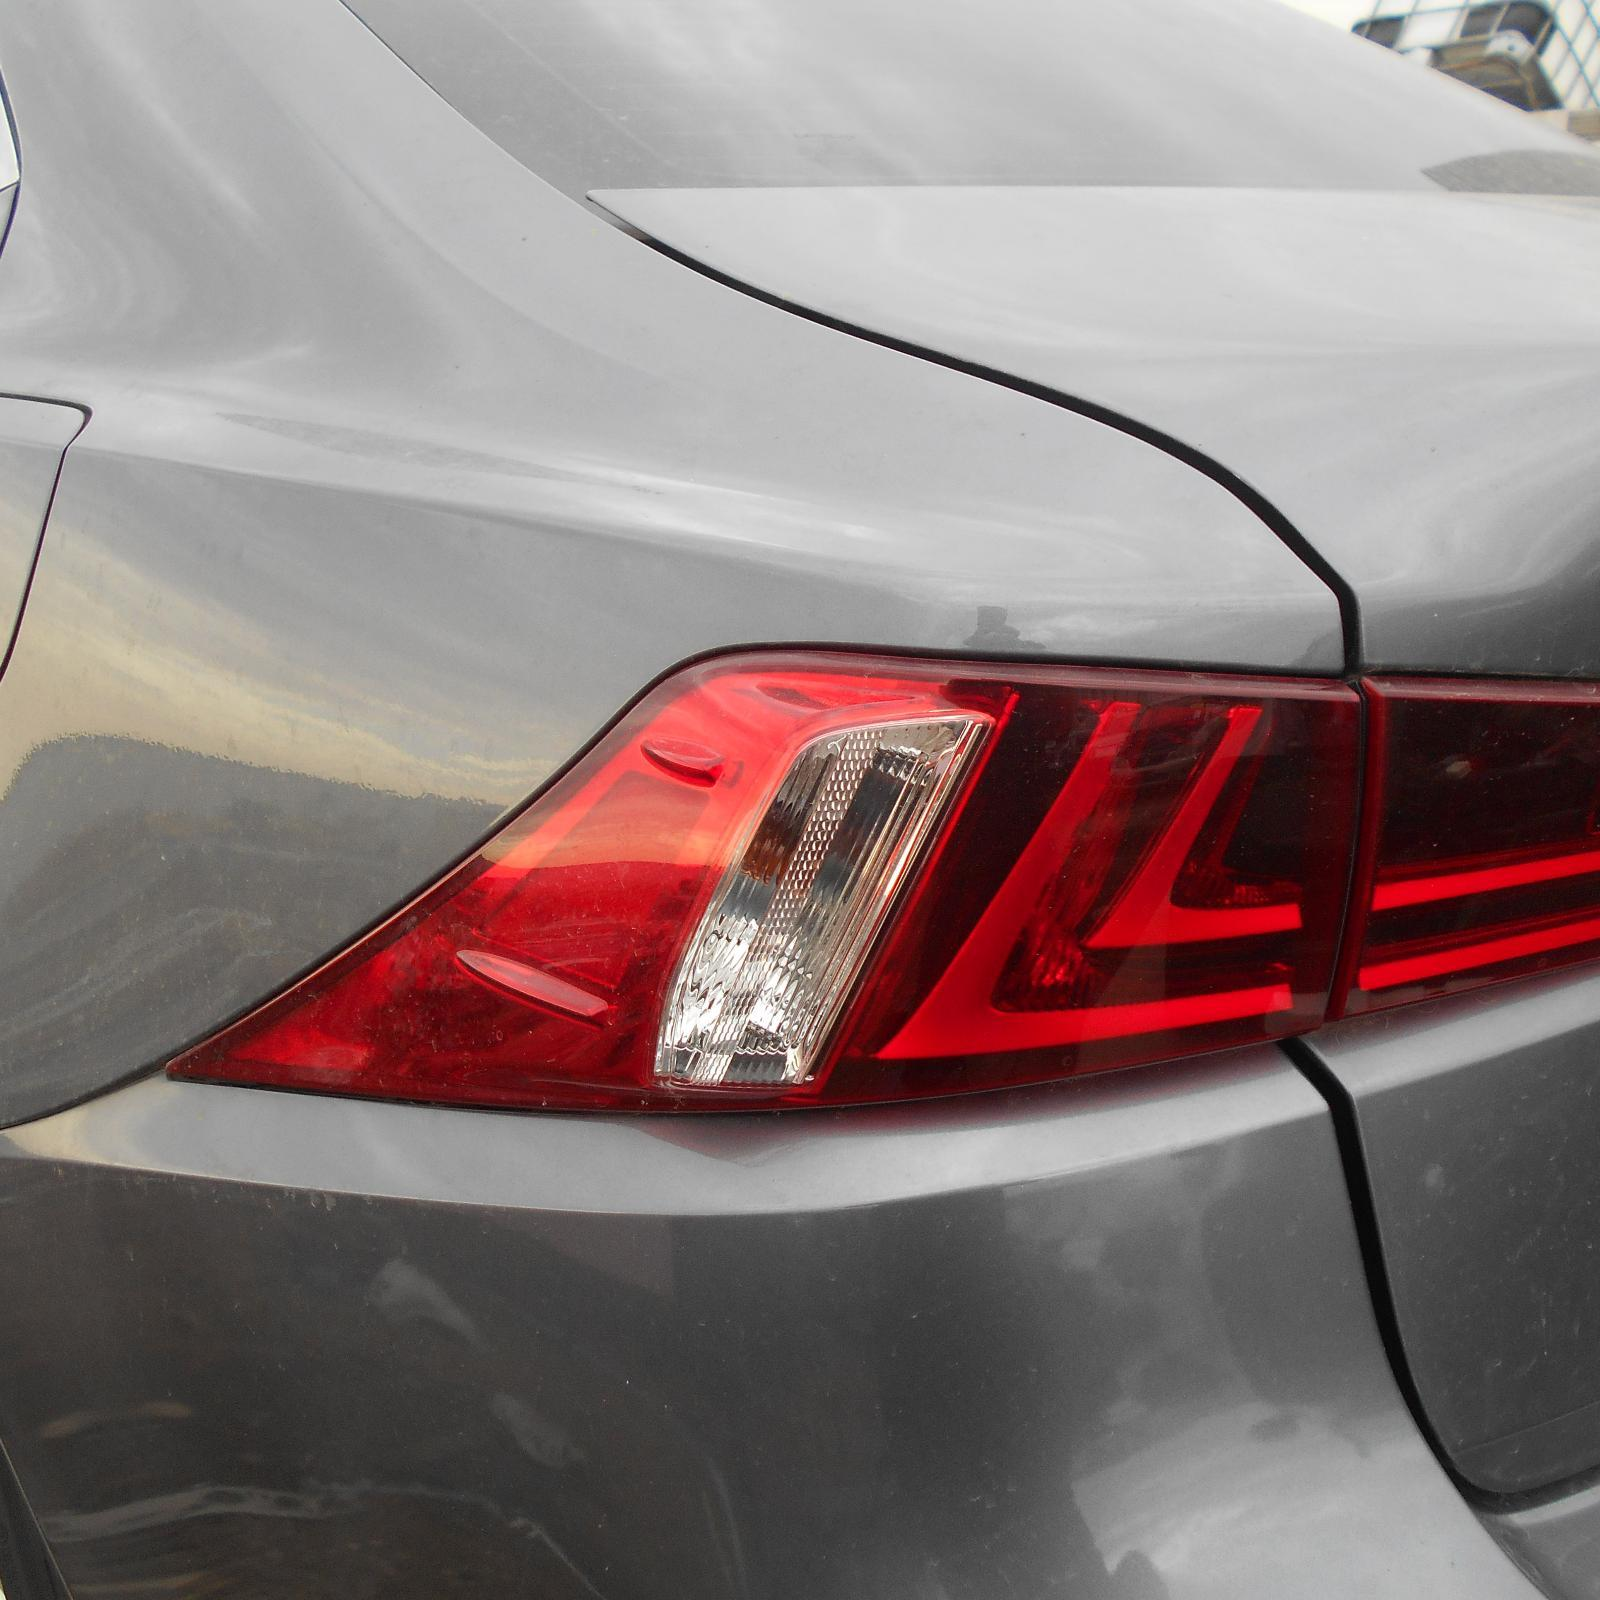 LEXUS IS, Left Taillight, IS200t/IS250/IS300H/IS350, XE30, 07/13-